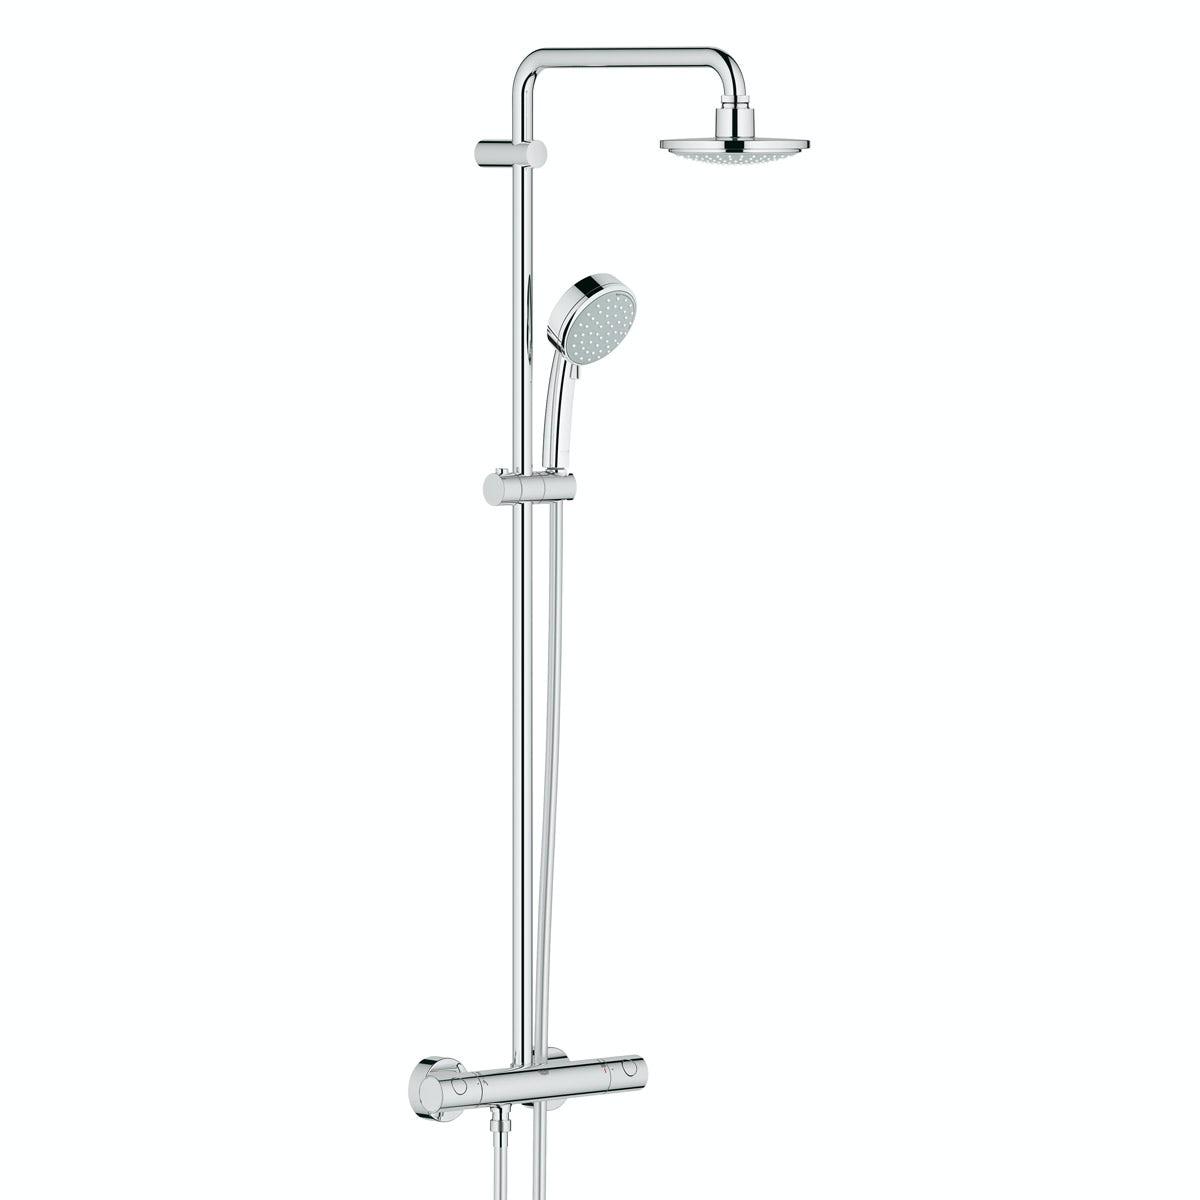 Grohe New Tempesta 160 Cosmopolitan shower system